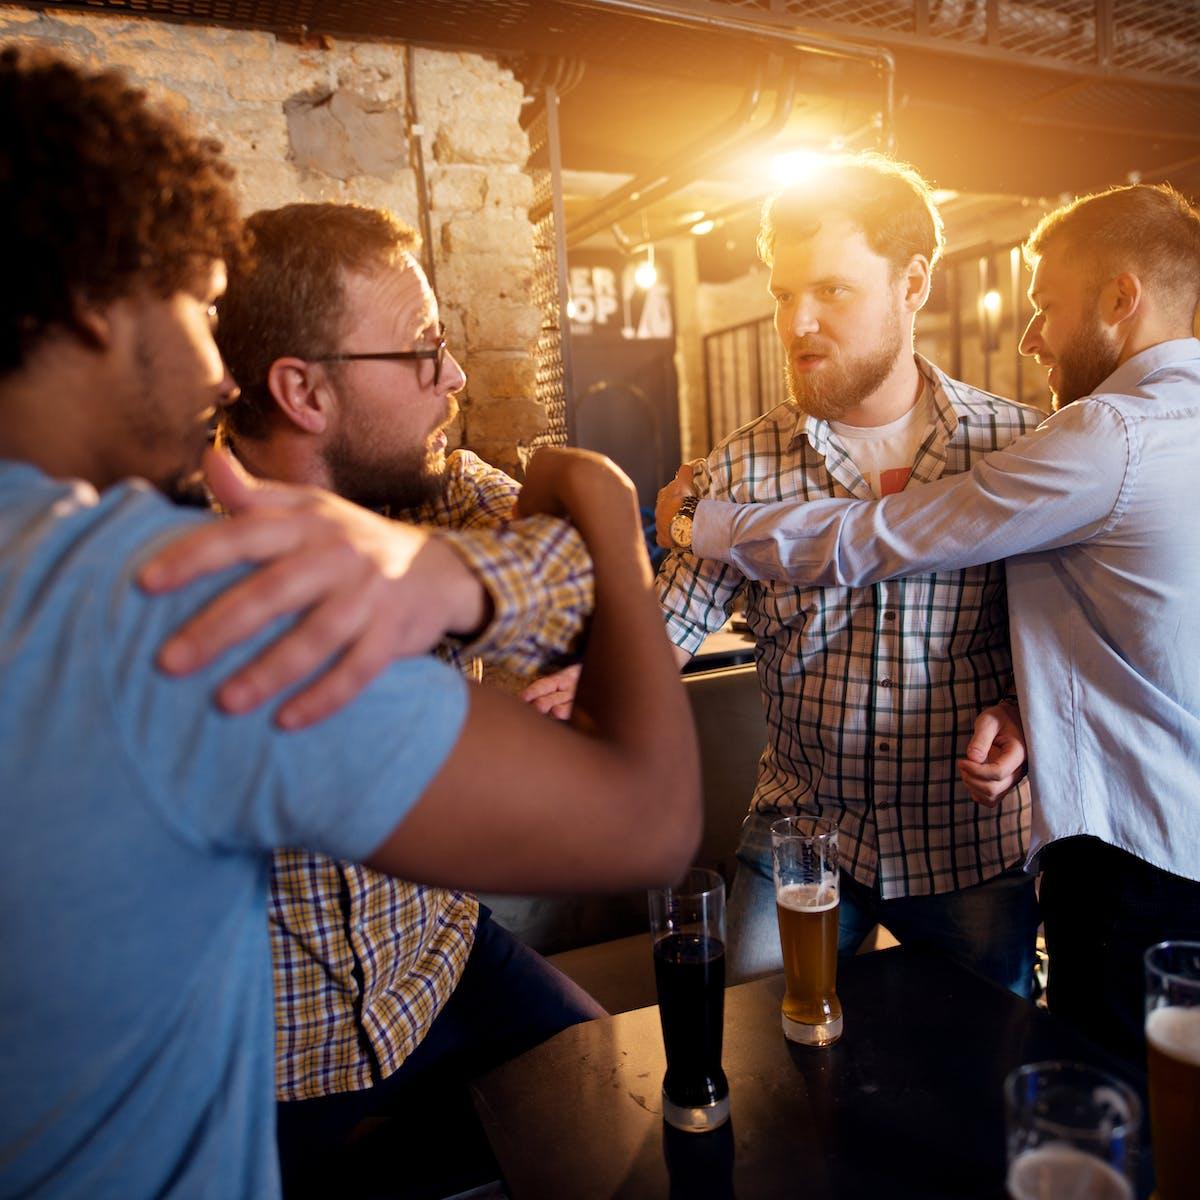 Australian study reveals the dangers of 'toxic masculinity' to men